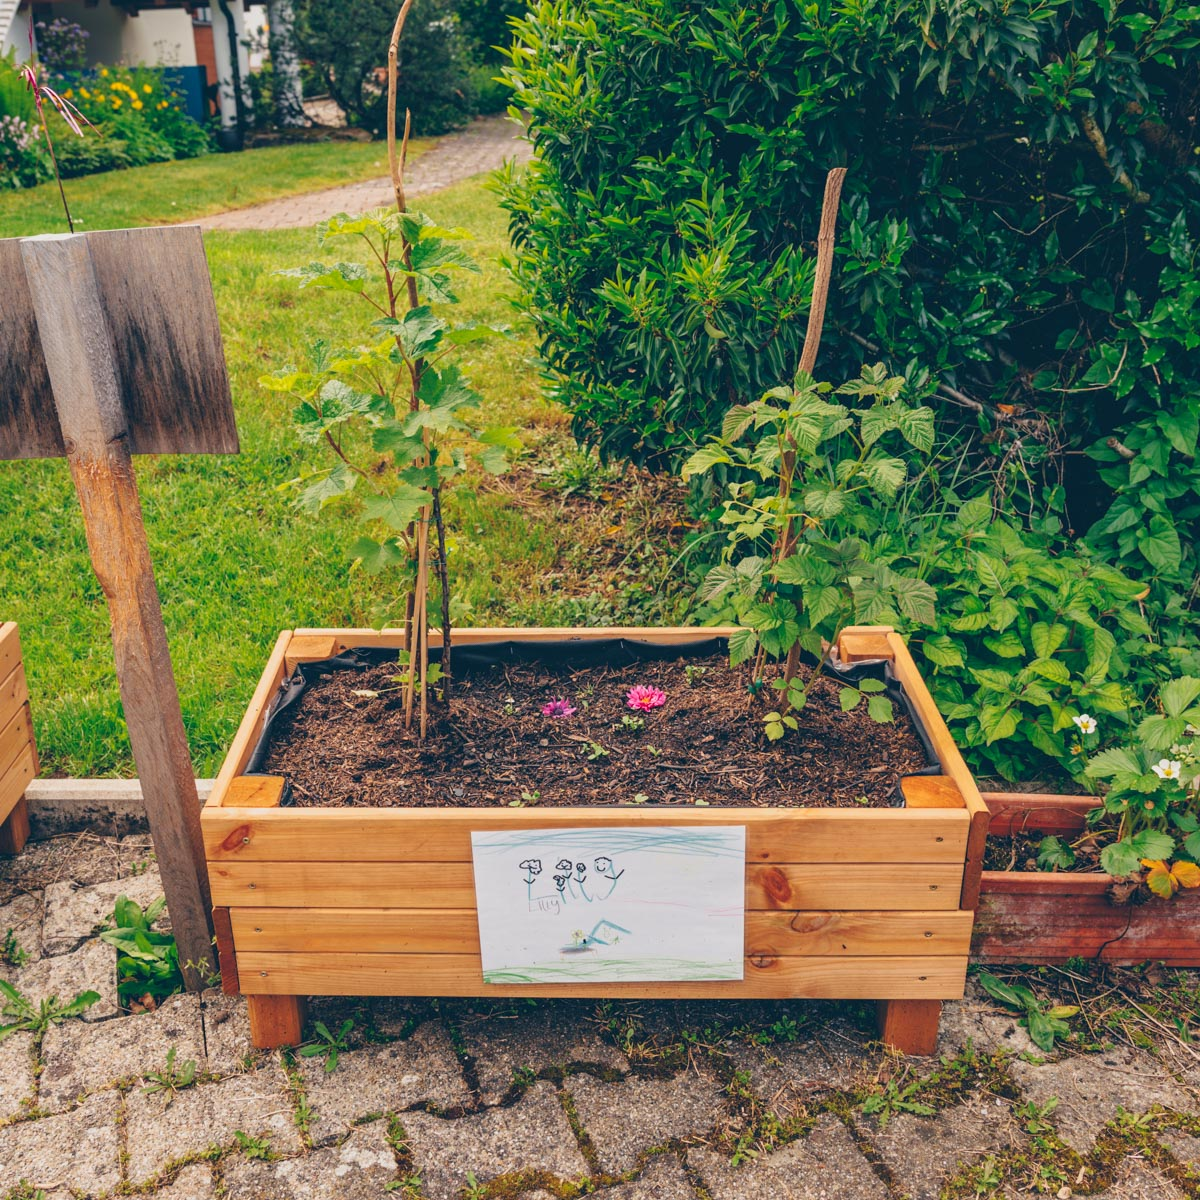 Urbanes Gärtnern mit Kindern